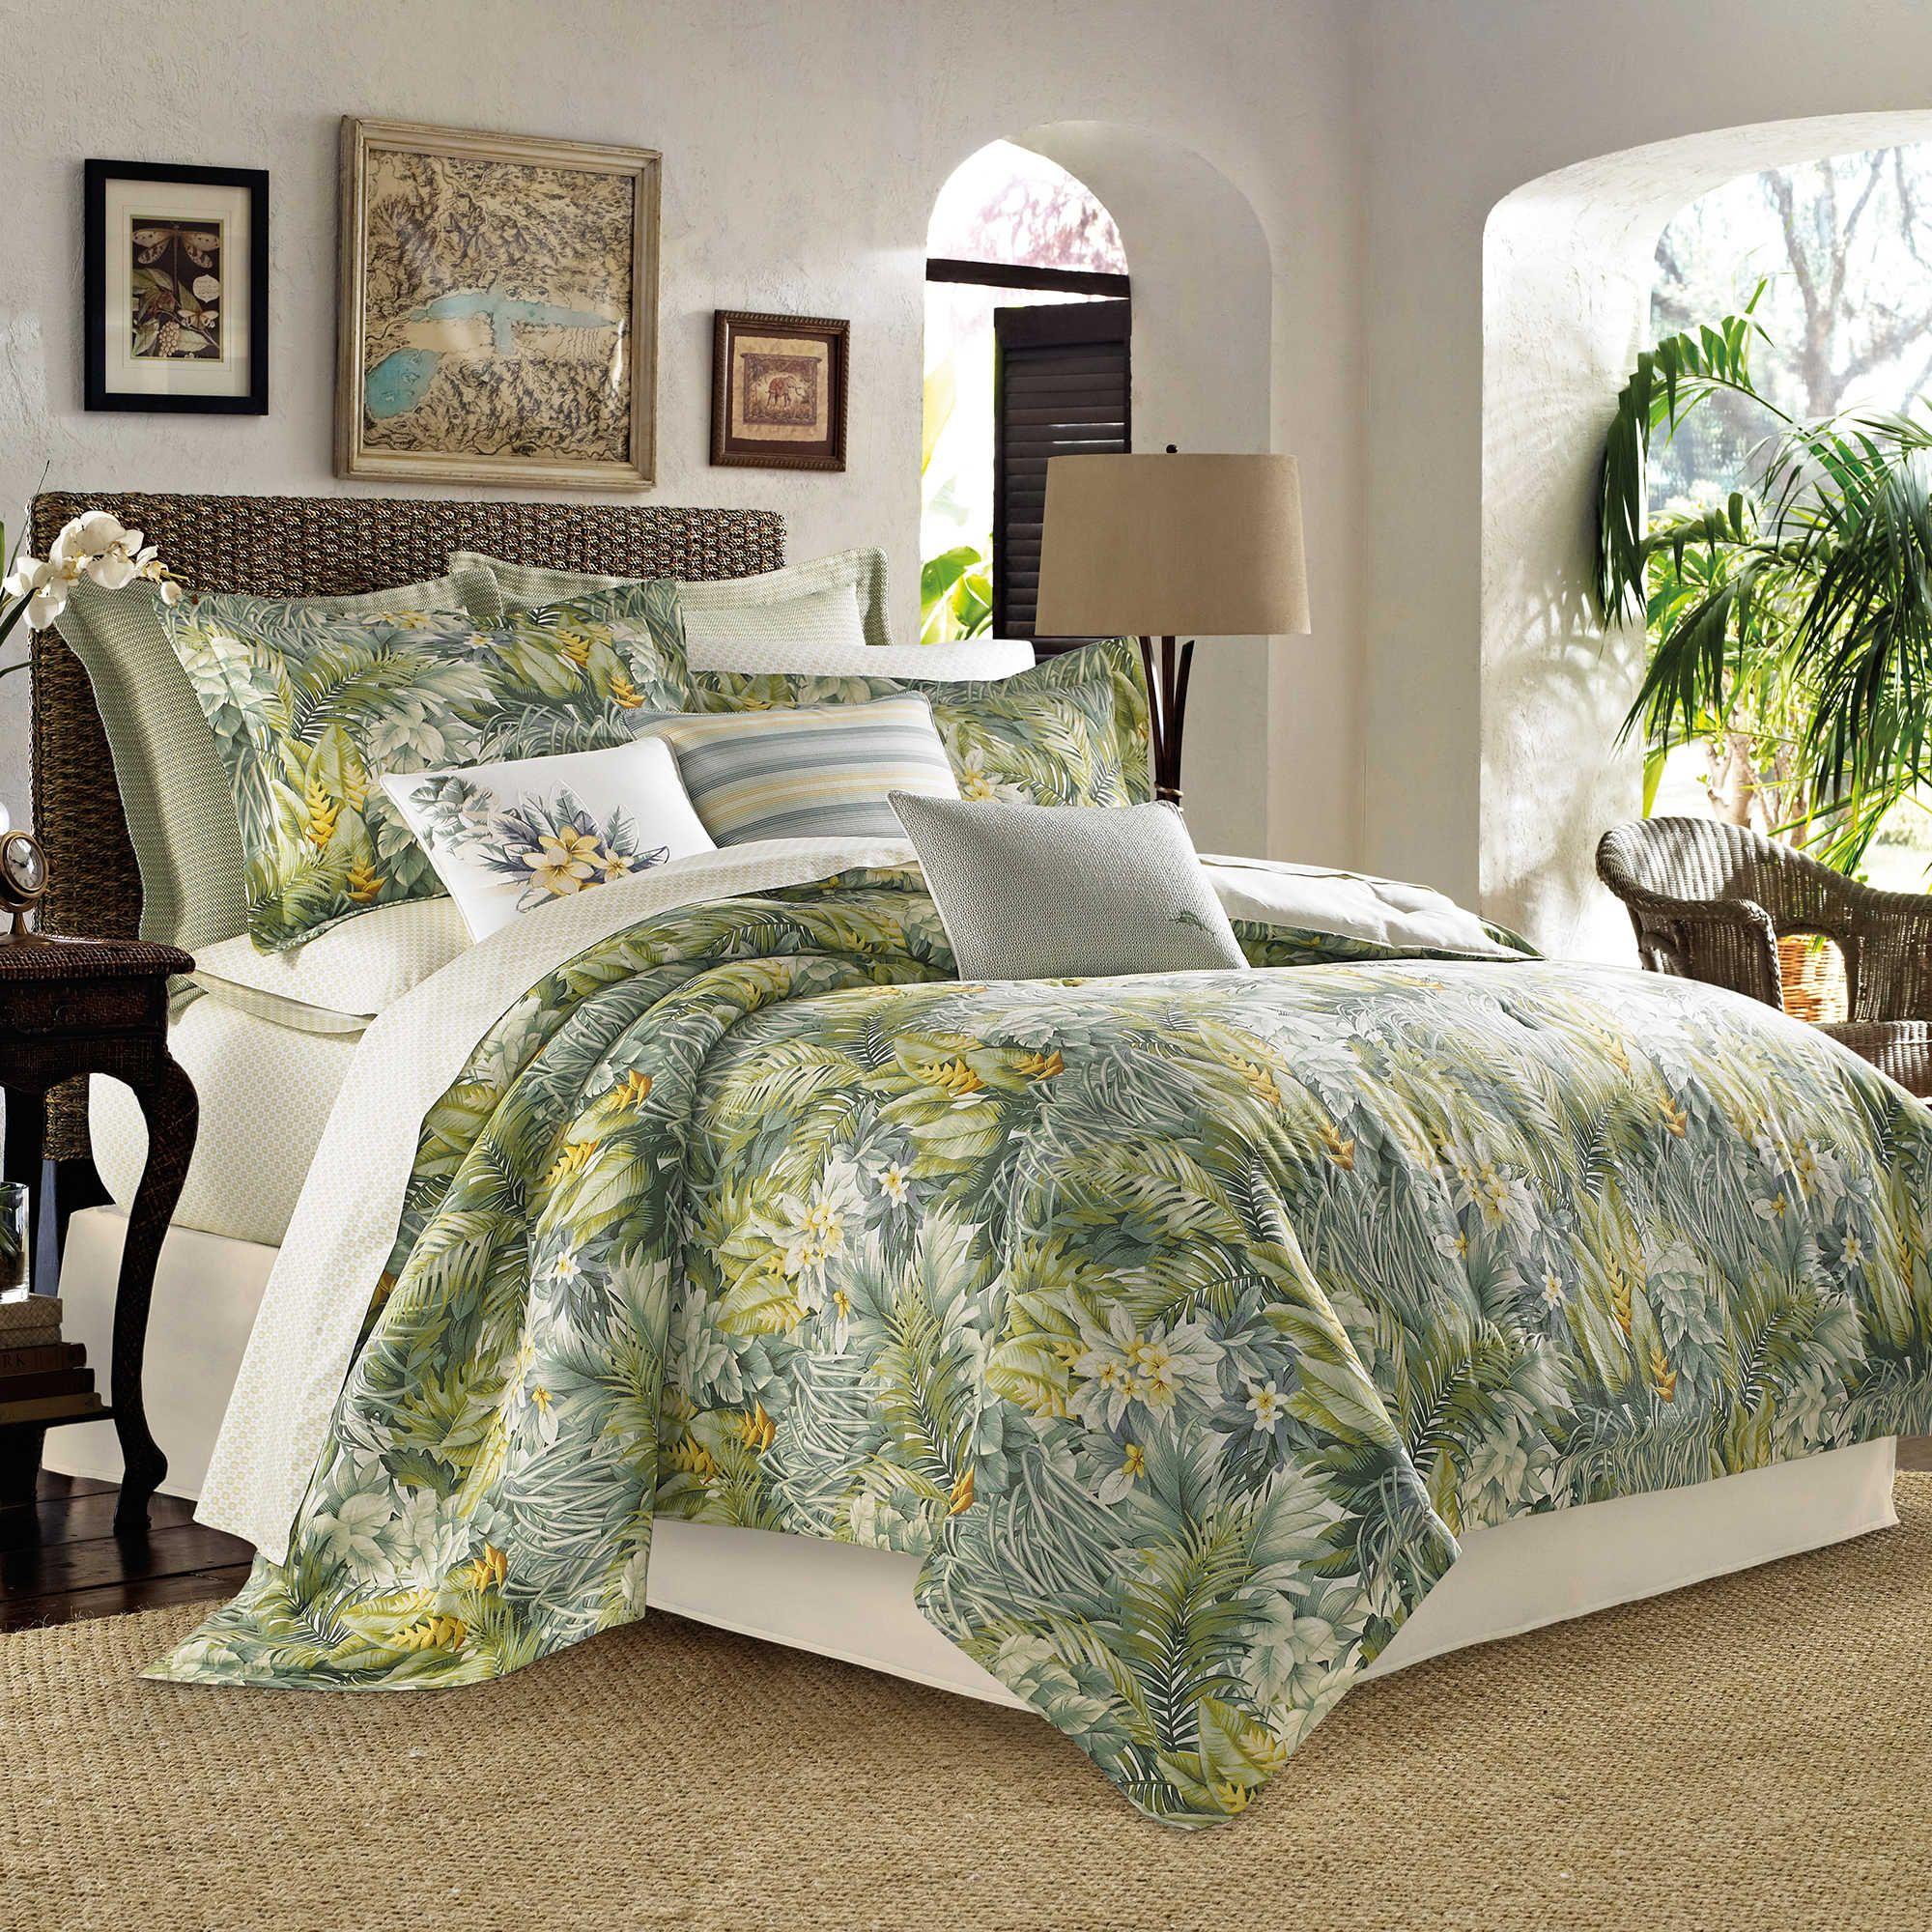 Tommy Bahama Cuba Cabana King Comforter Set Comforter Sets